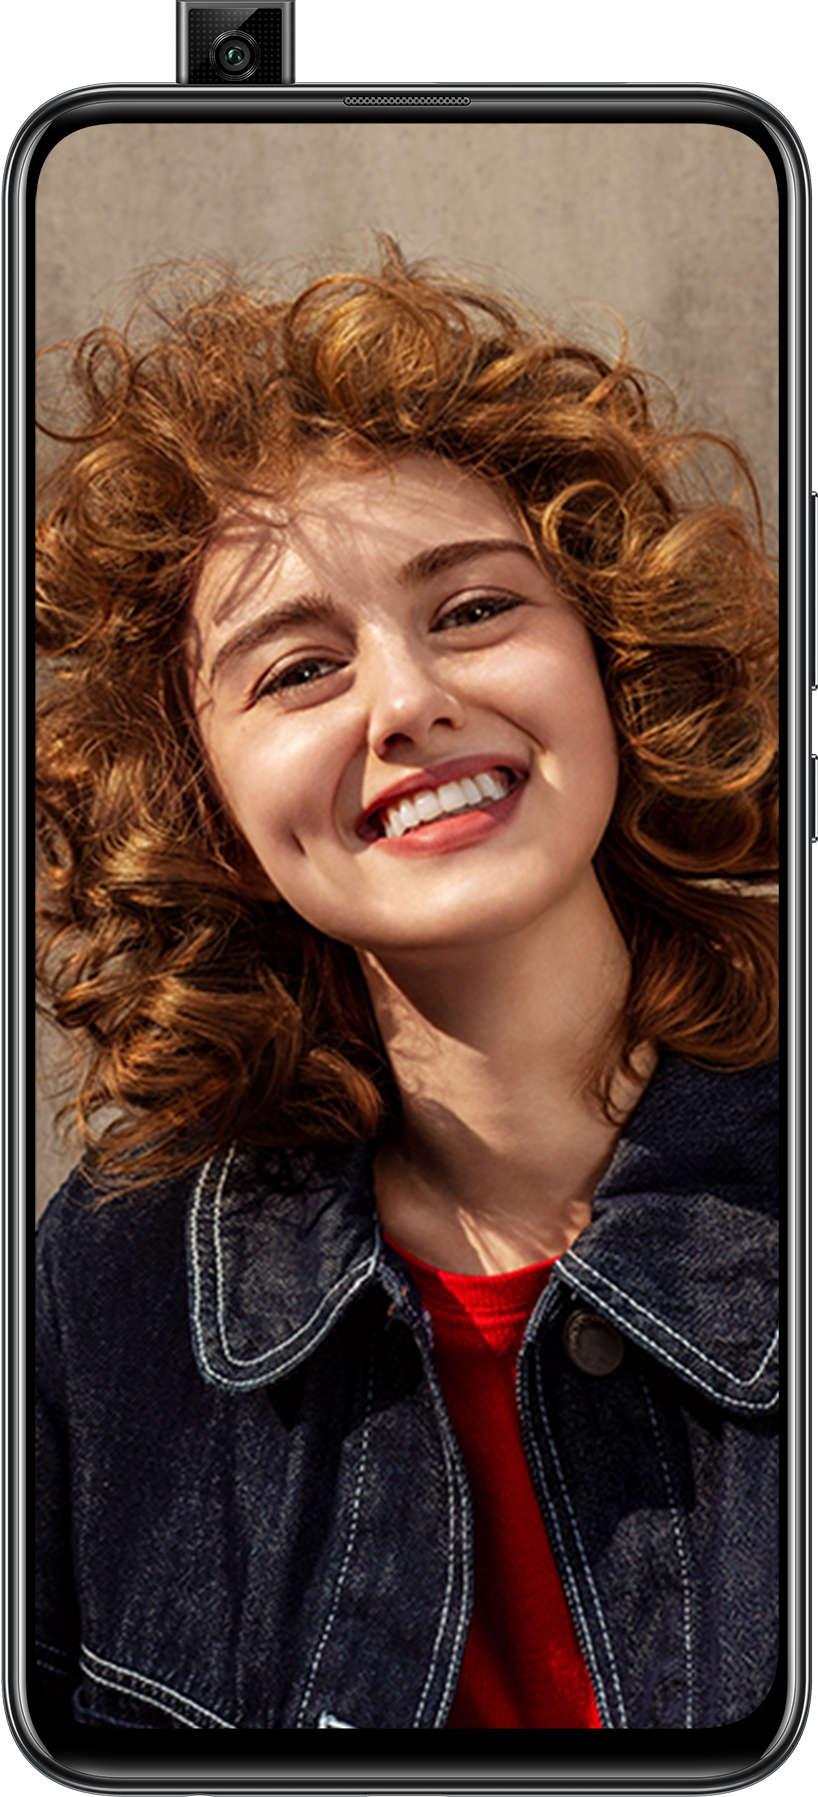 huawei y9 prime 2019 ai selfie front camera